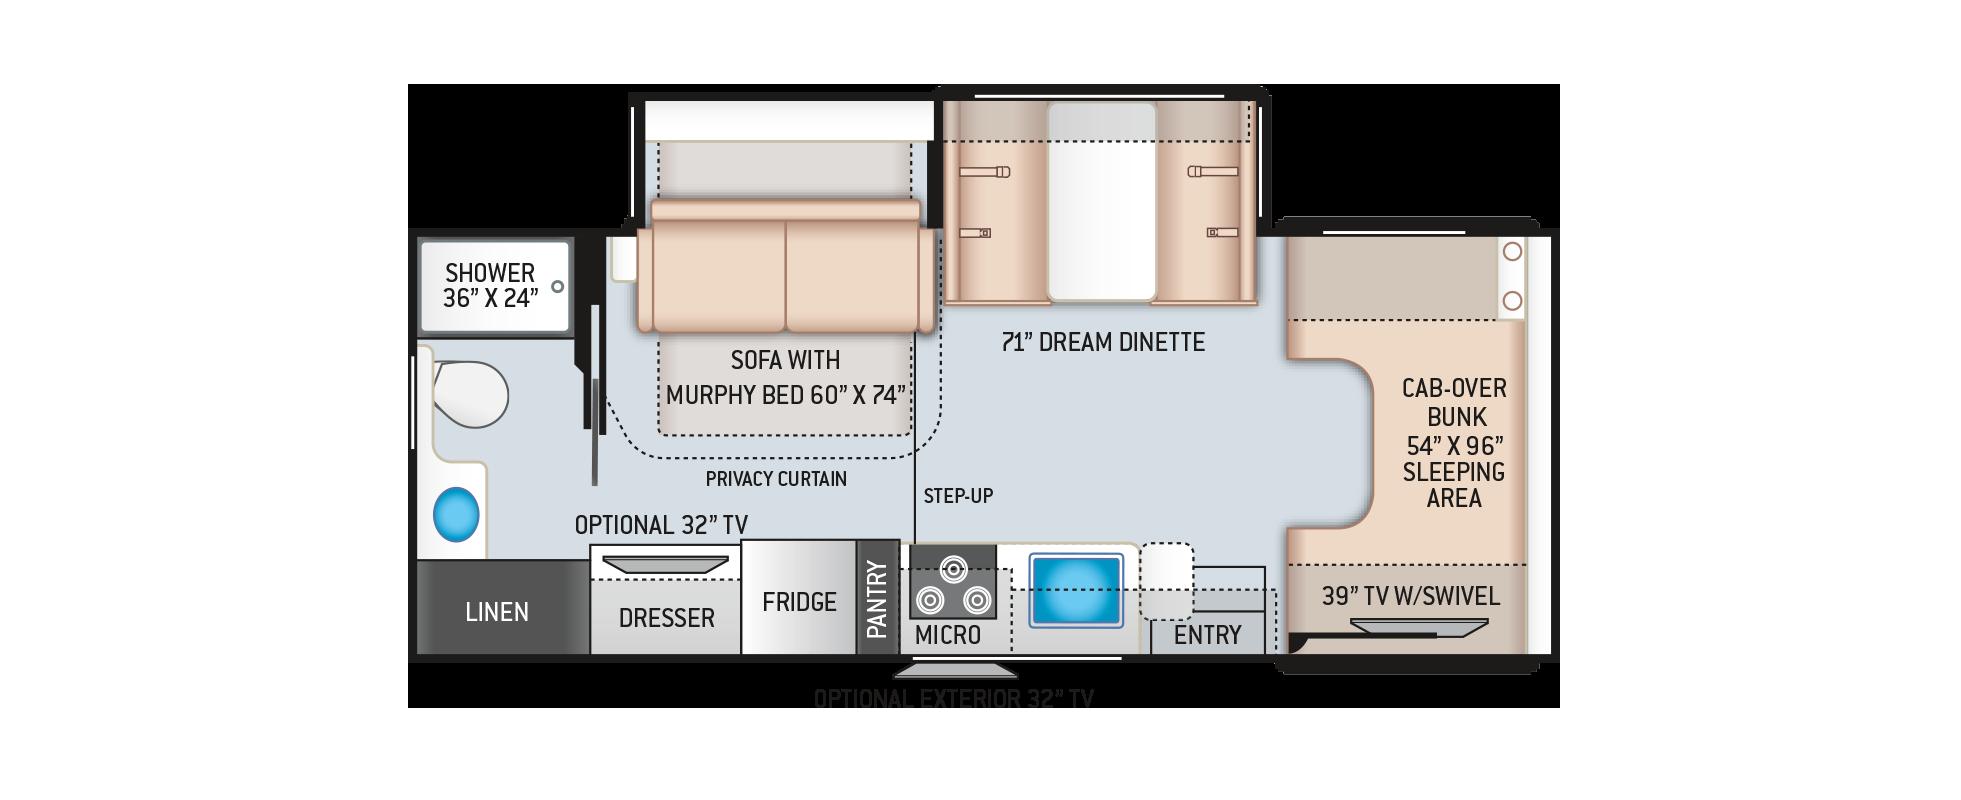 Chateau Class C Motorhome 25M Floor Plan